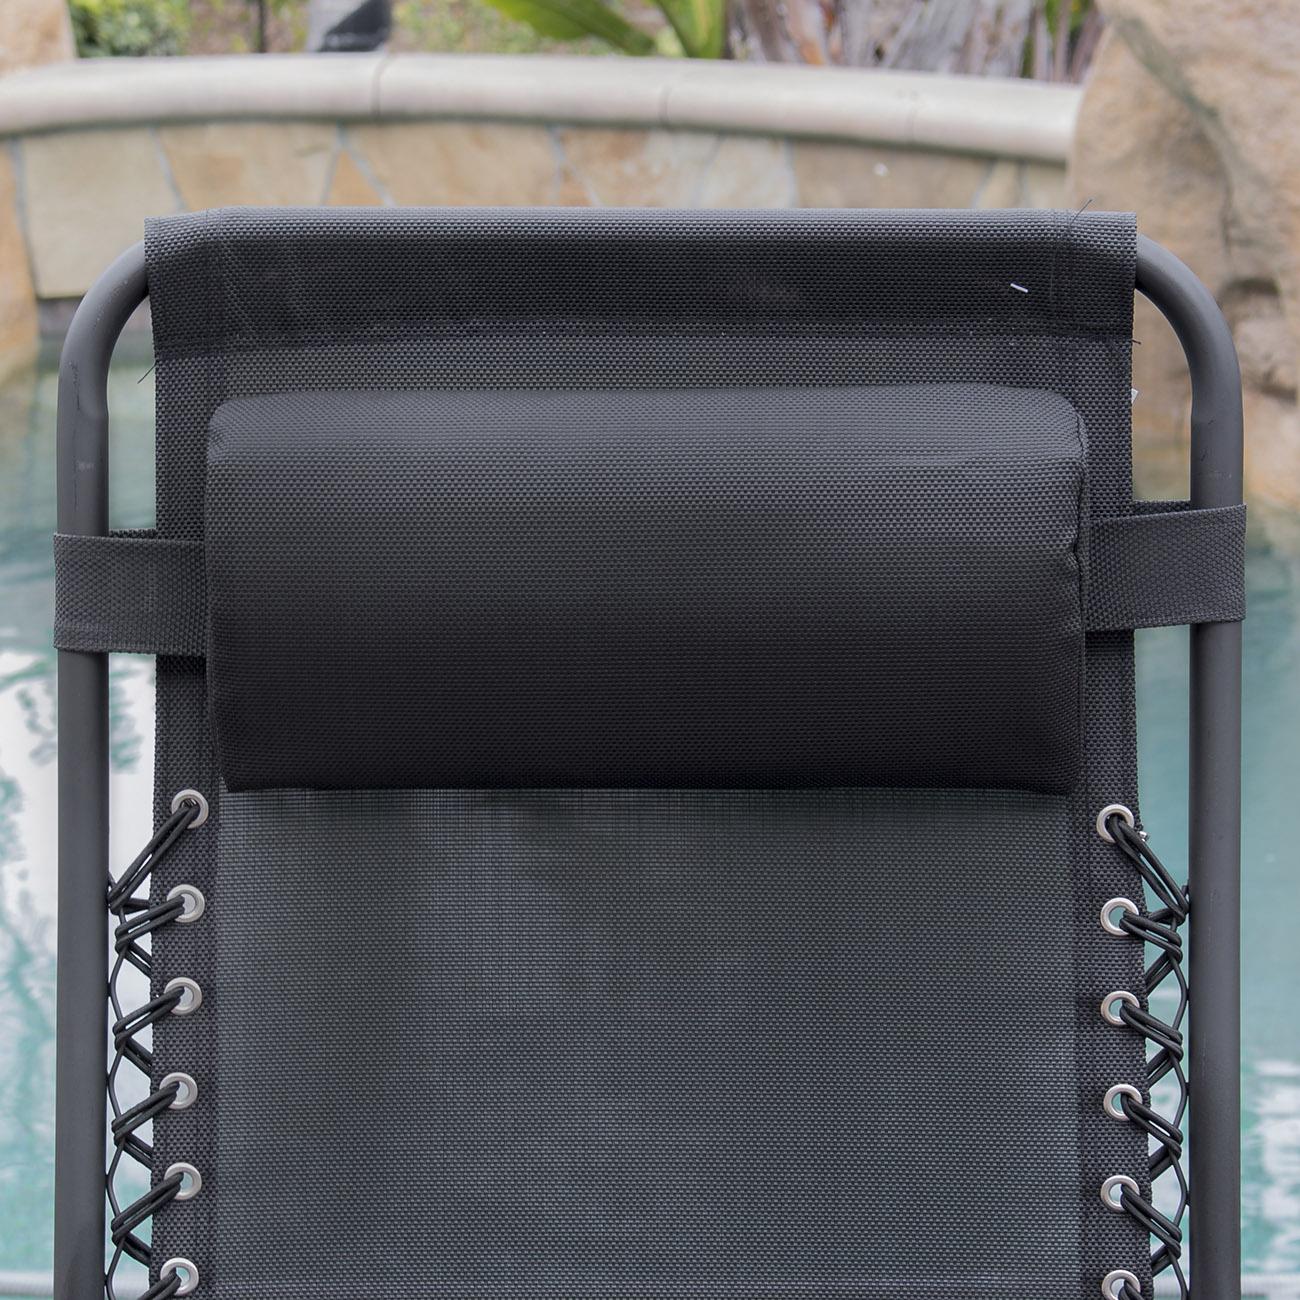 2PC Zero Gravity Chairs Lounge Patio Folding Recliner ...